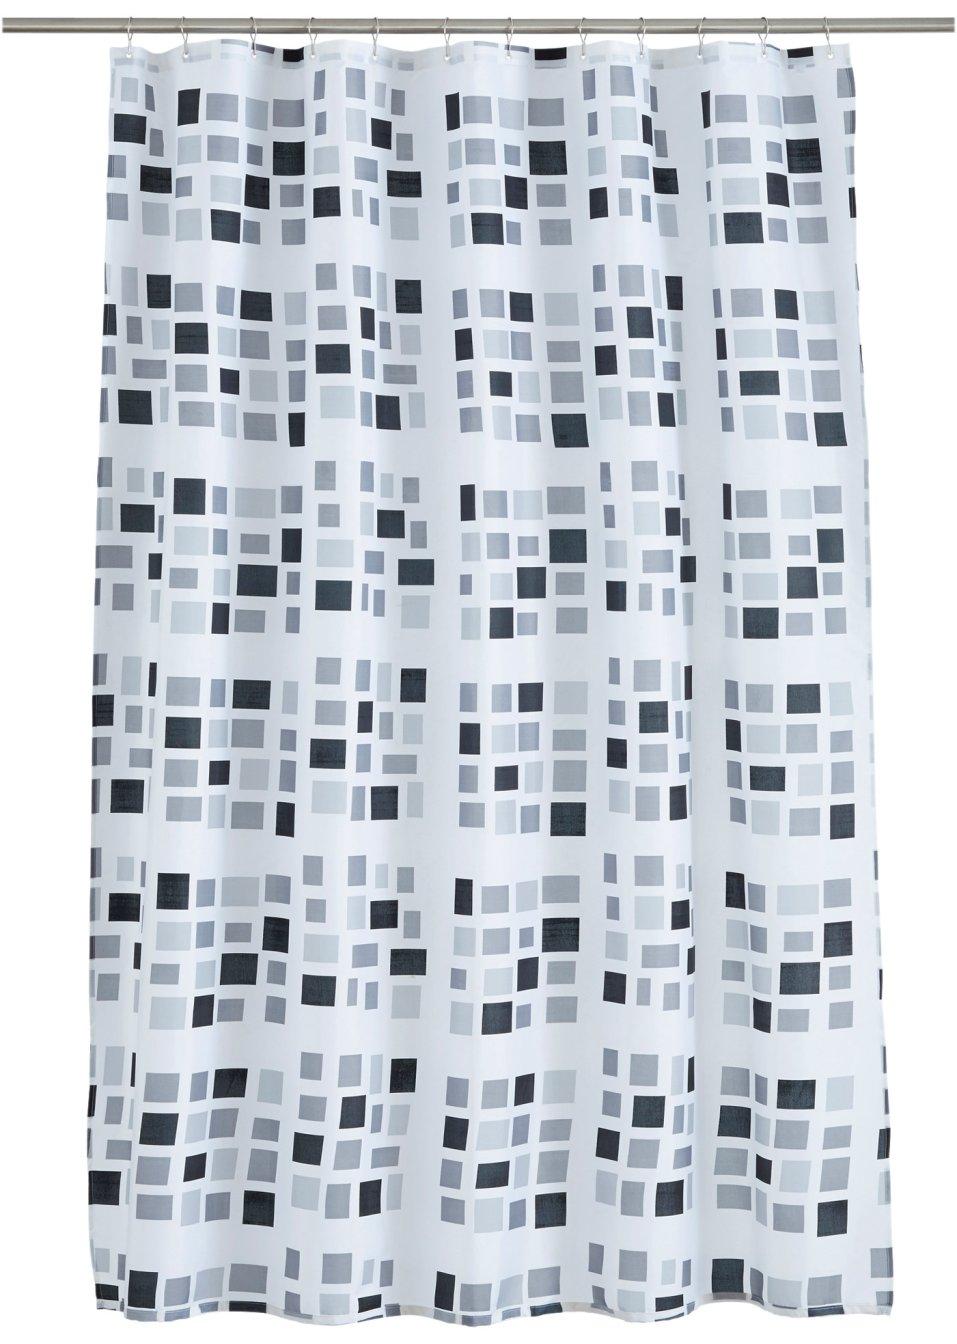 duschvorhang stones schwarz weiss online bestellen. Black Bedroom Furniture Sets. Home Design Ideas